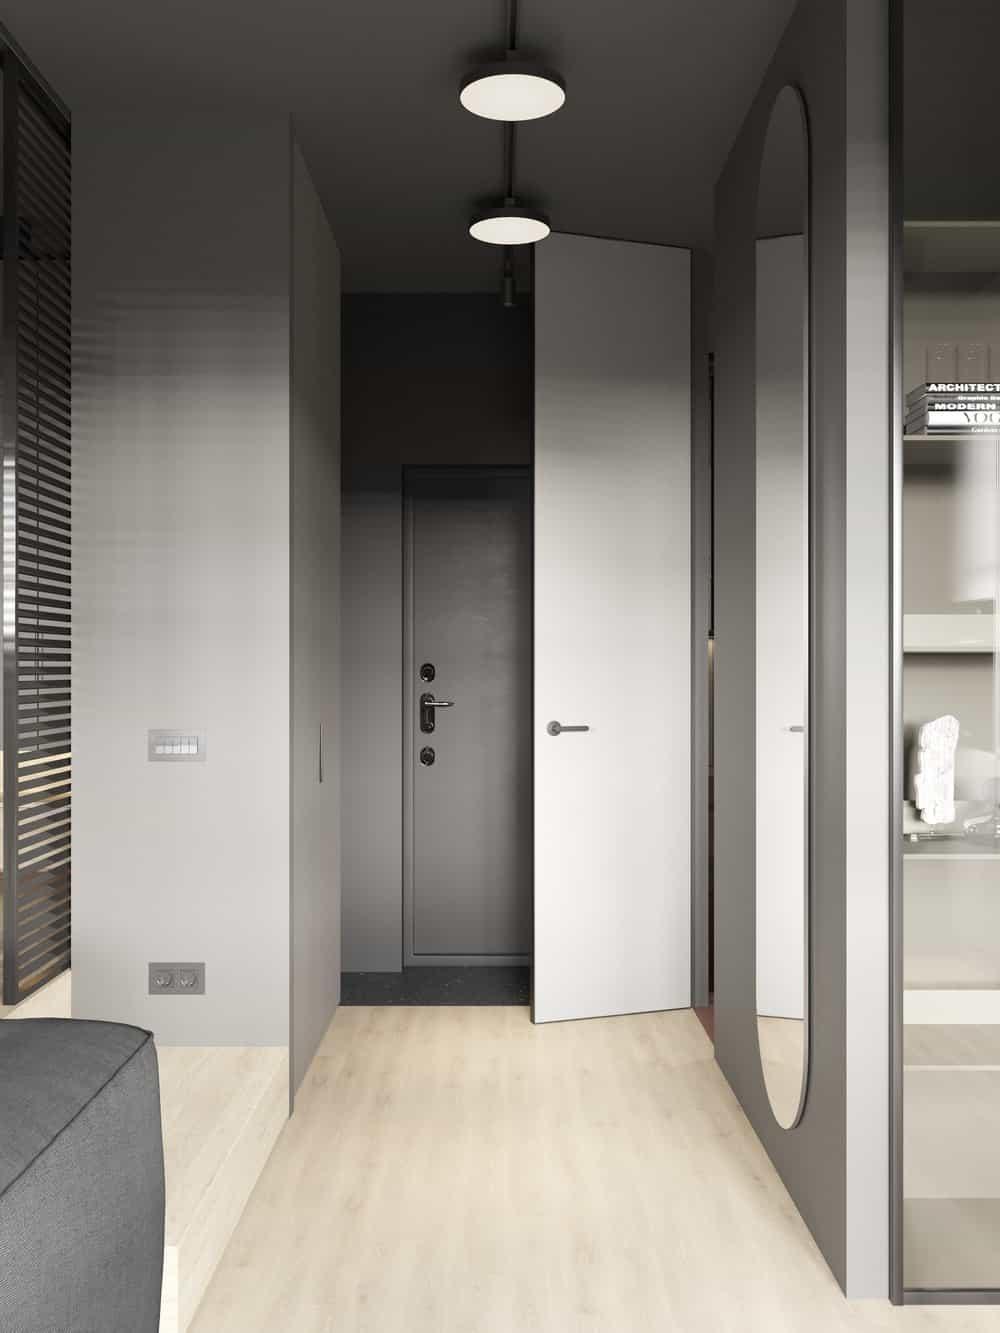 Walk-in closet in the Goose designed by Cartelle Design.